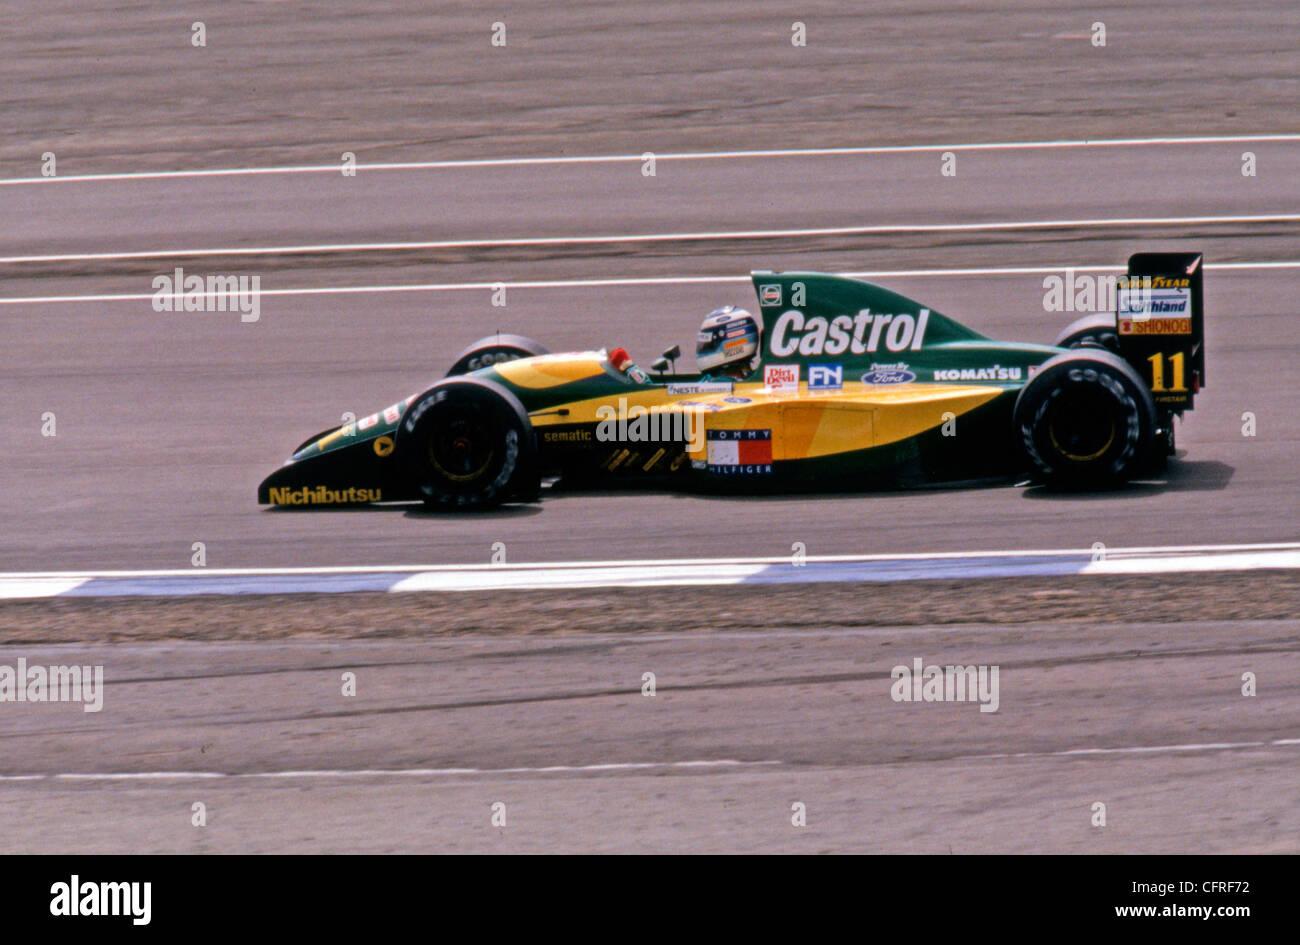 Mikka Hakkinen in Lotus Ford 107 1992 British Grand Prix - Stock Image